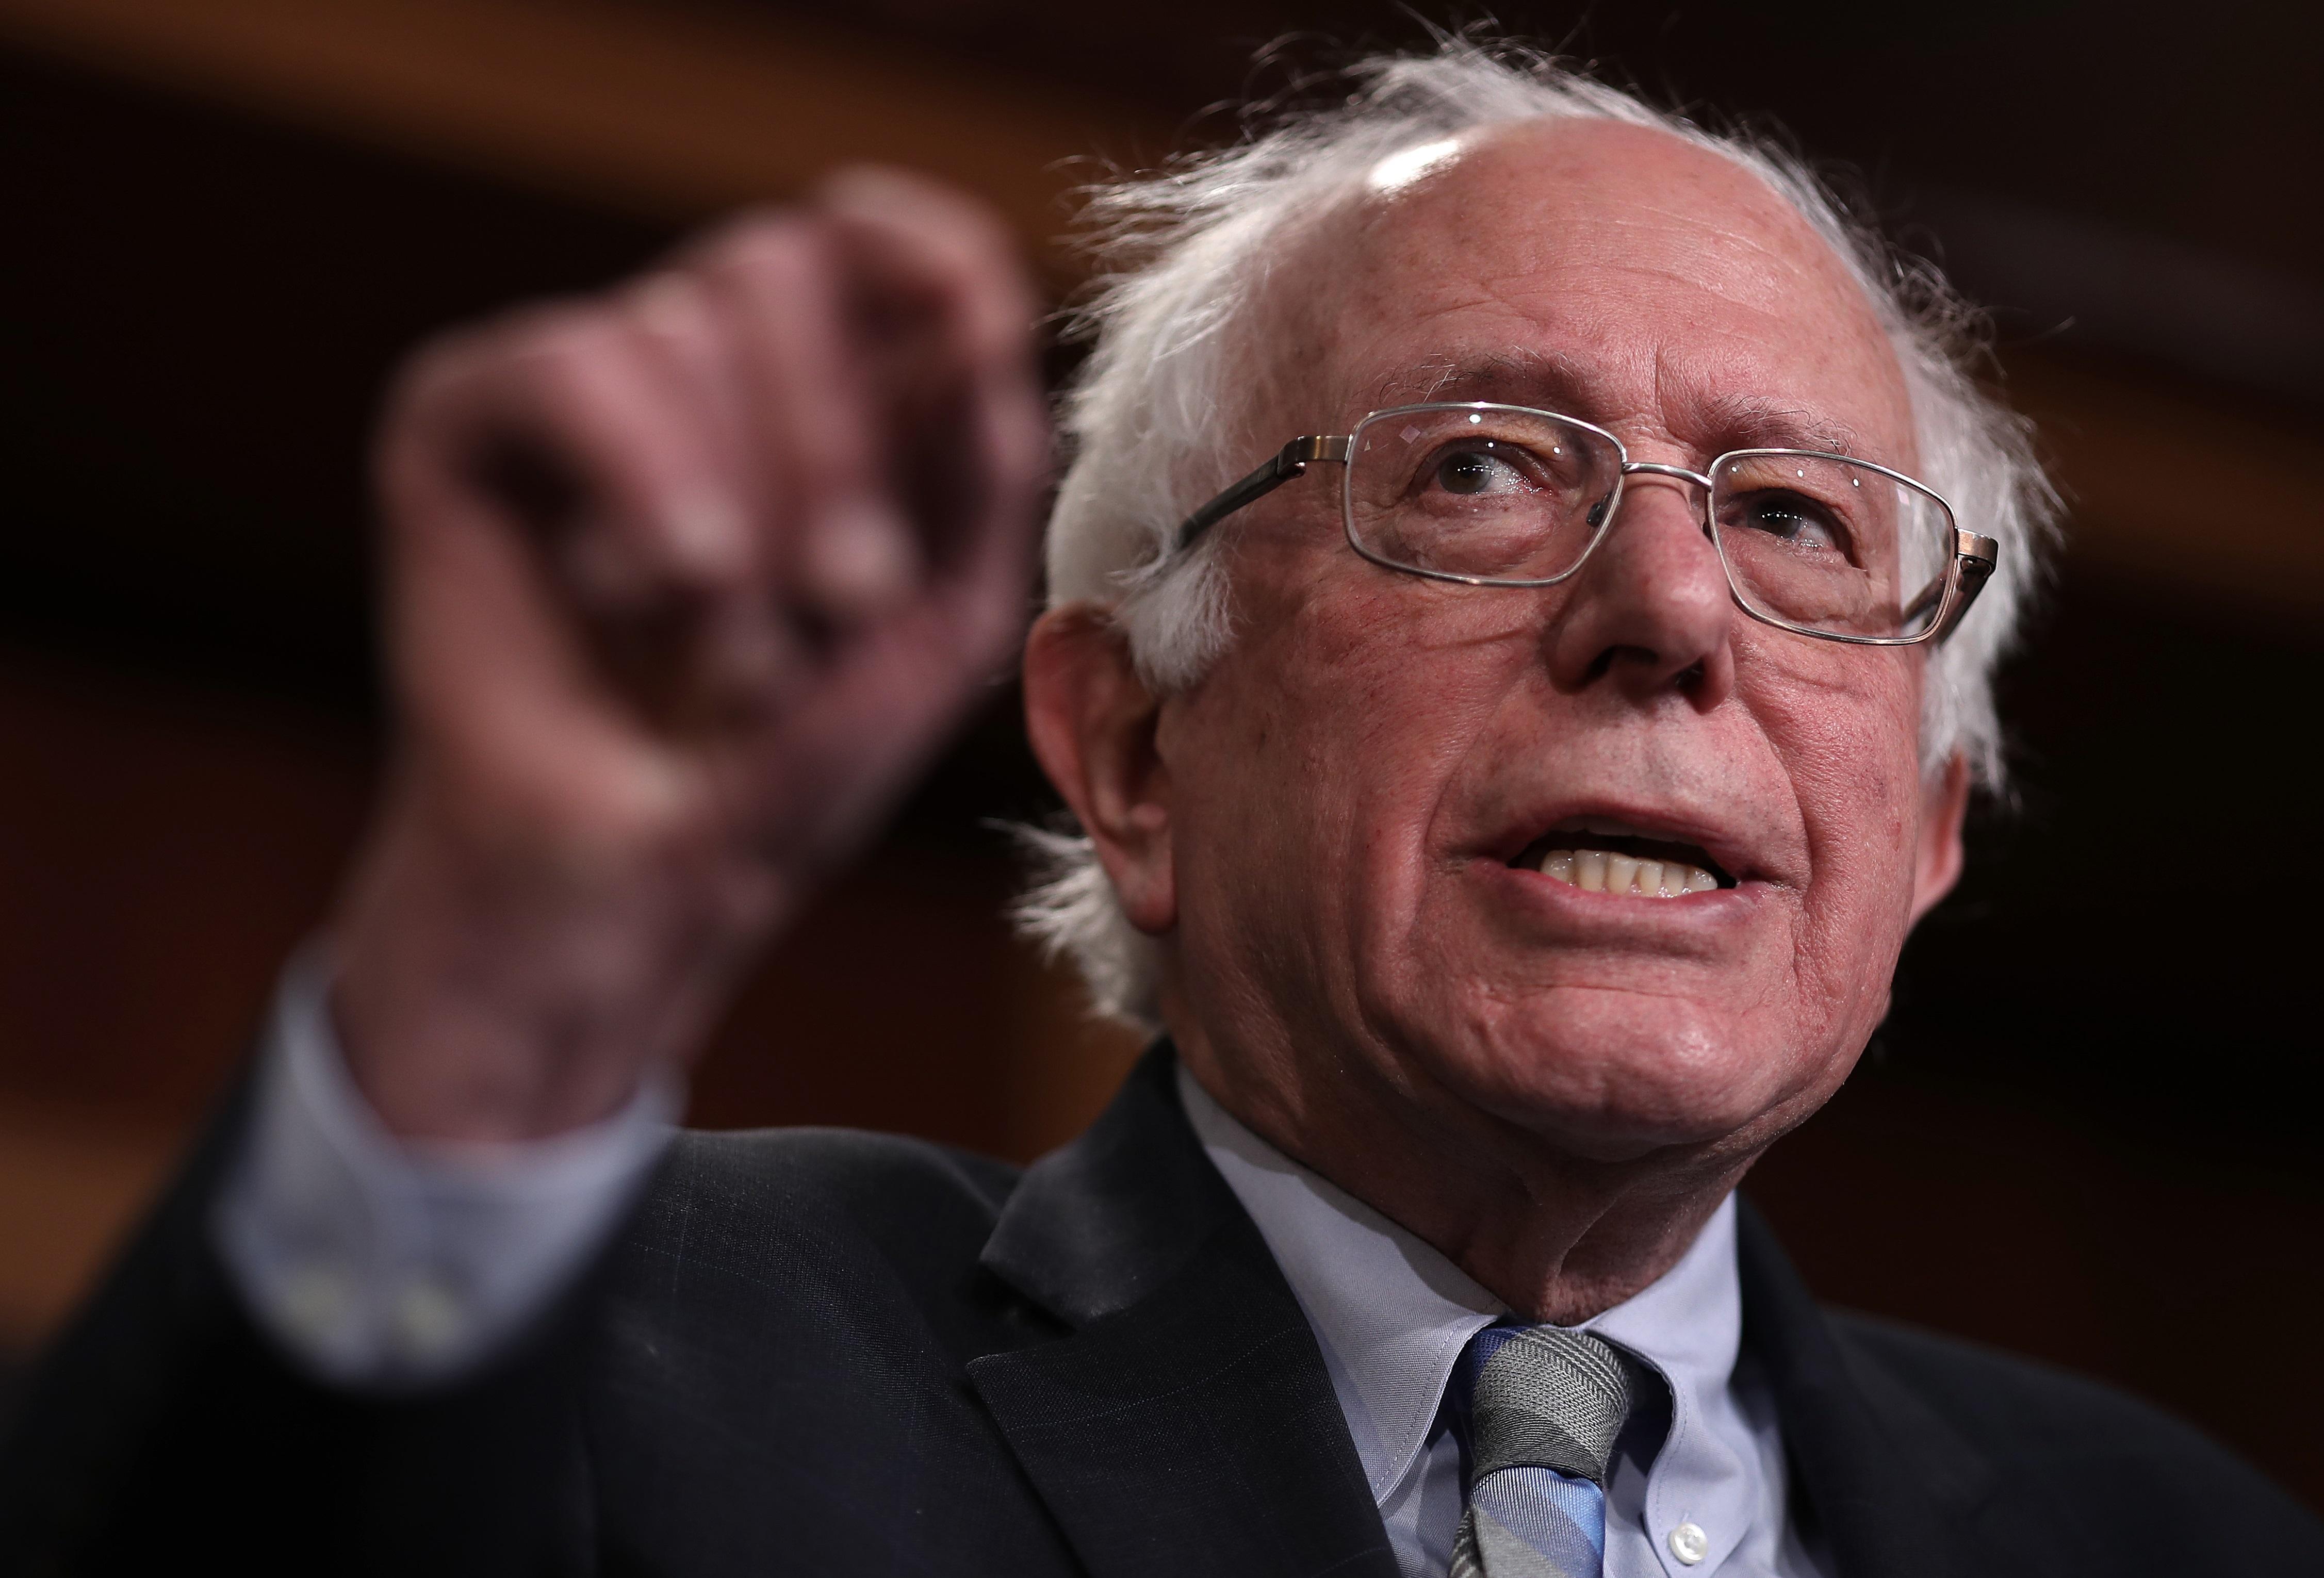 Socialist Sen. Bernie Sanders Refuses to Call for Venezuela's Nicolás Maduro to Step Down